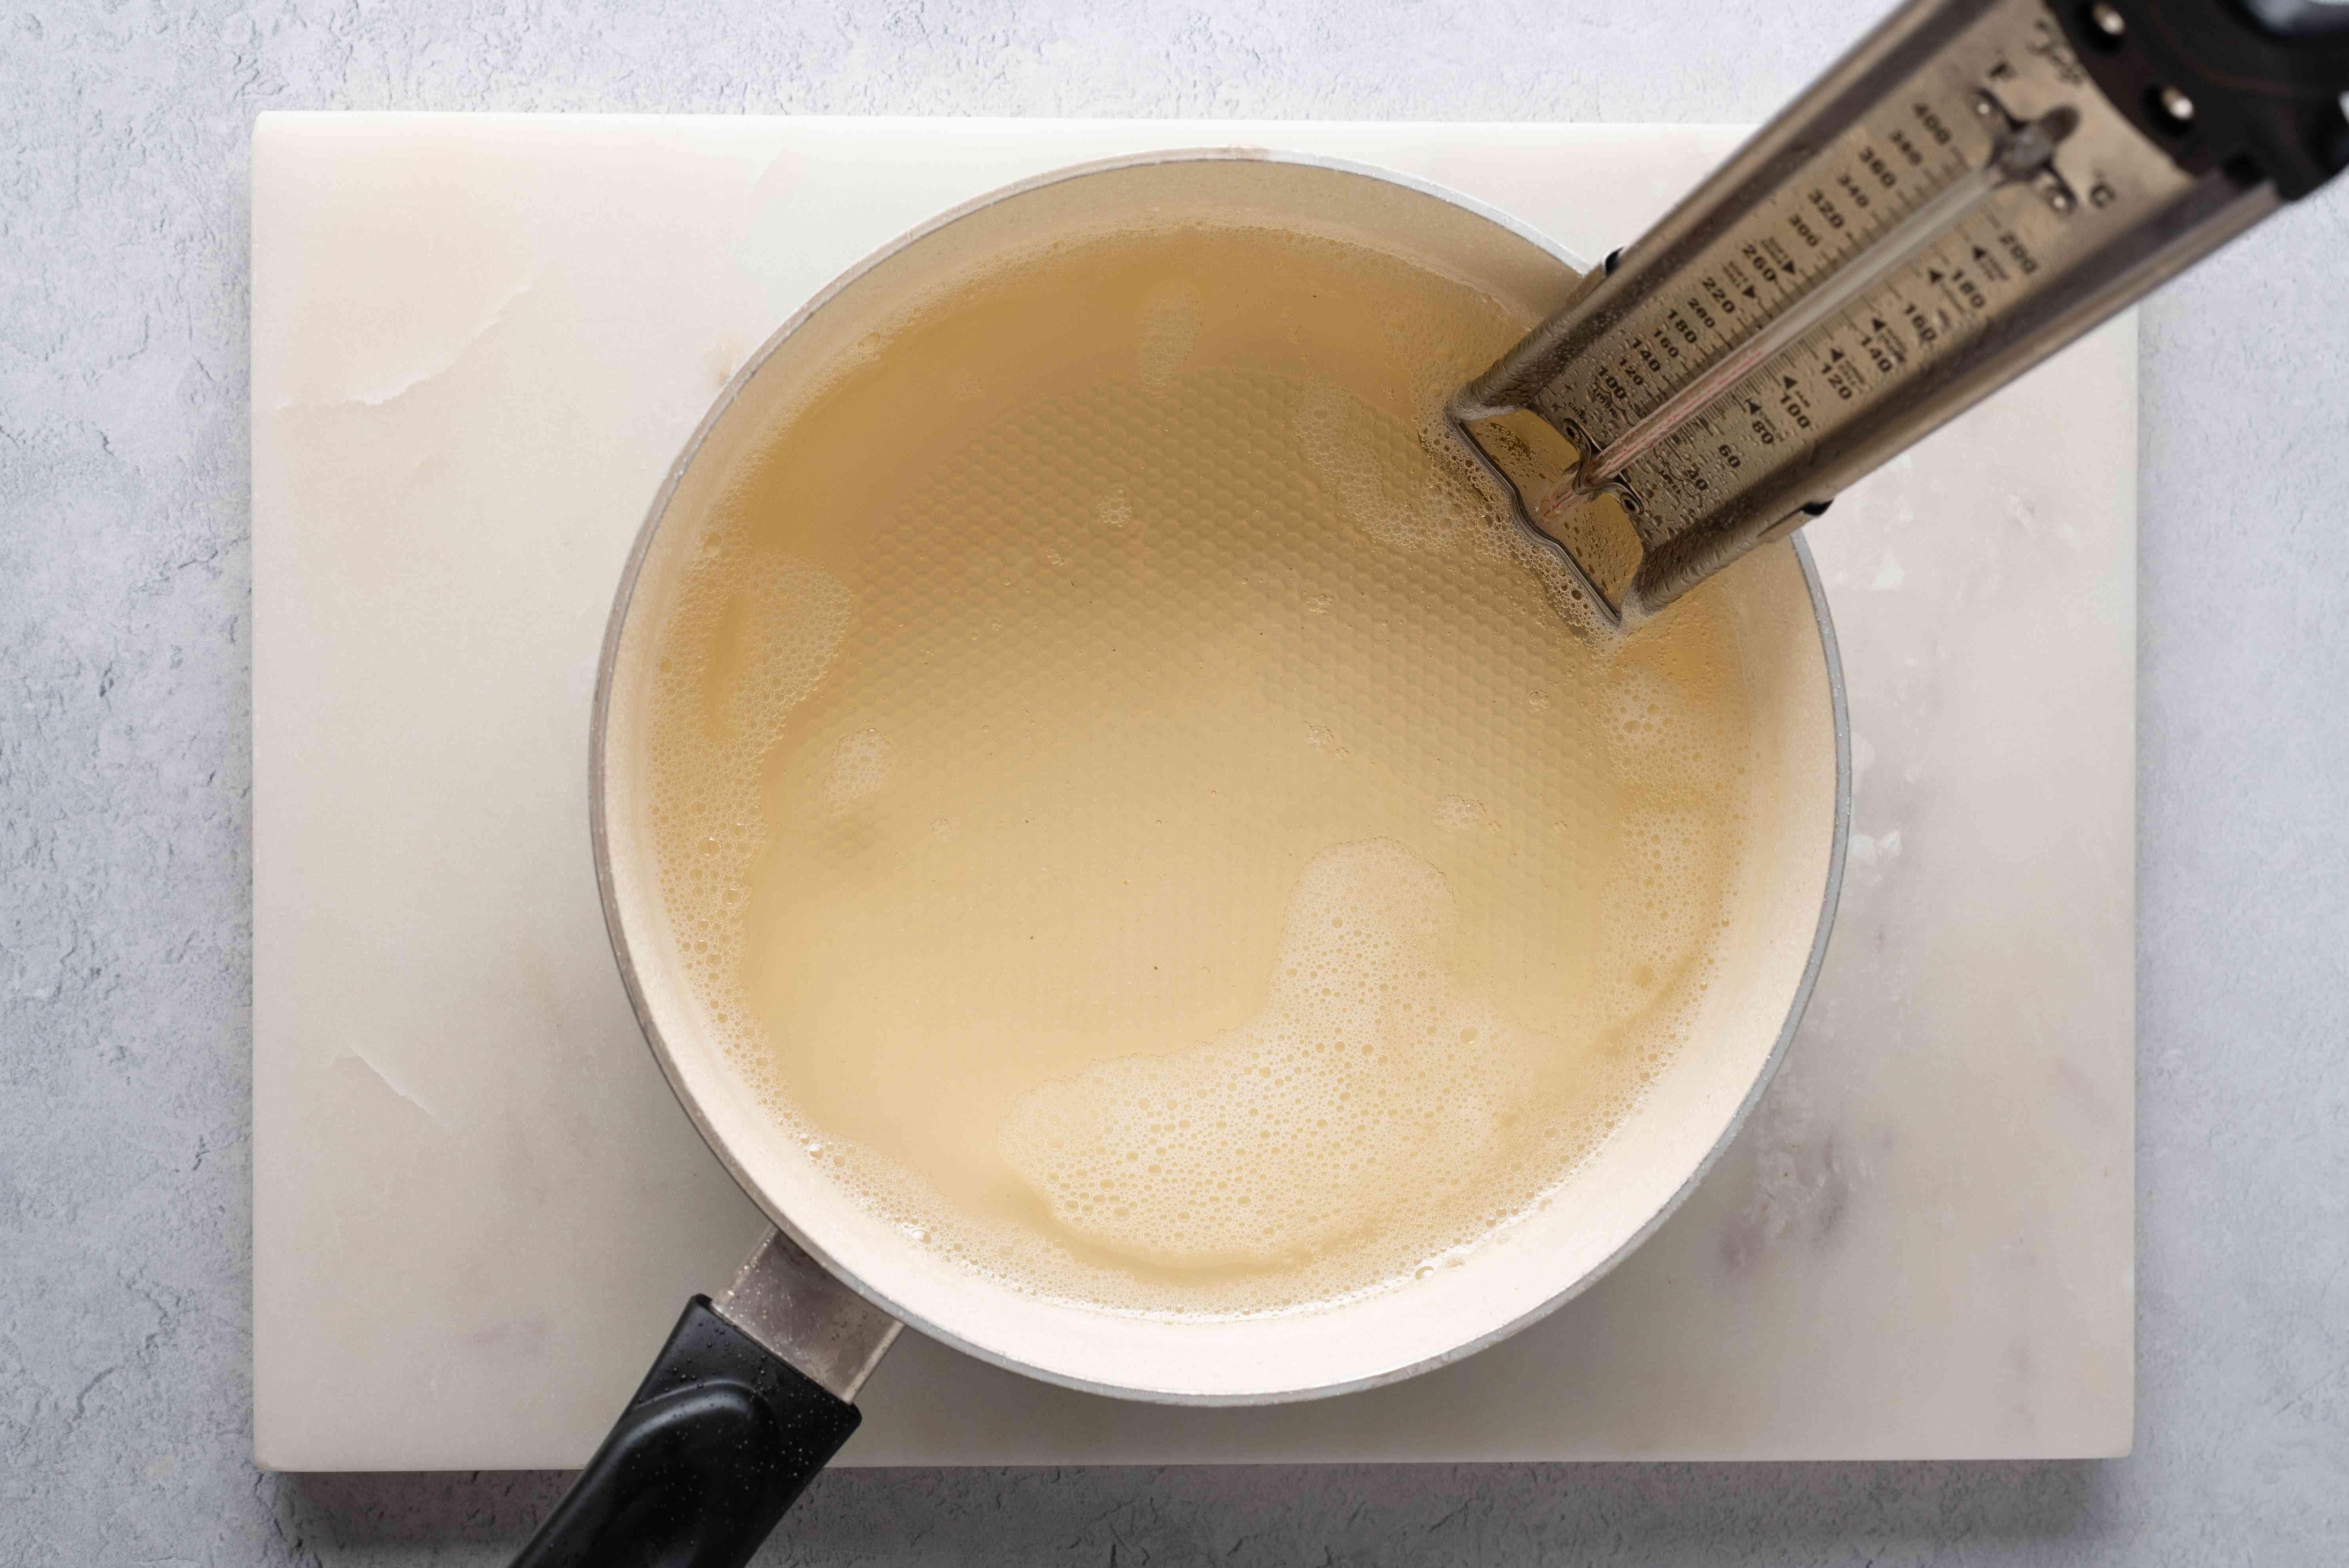 sugar mixture cooking in a saucepan